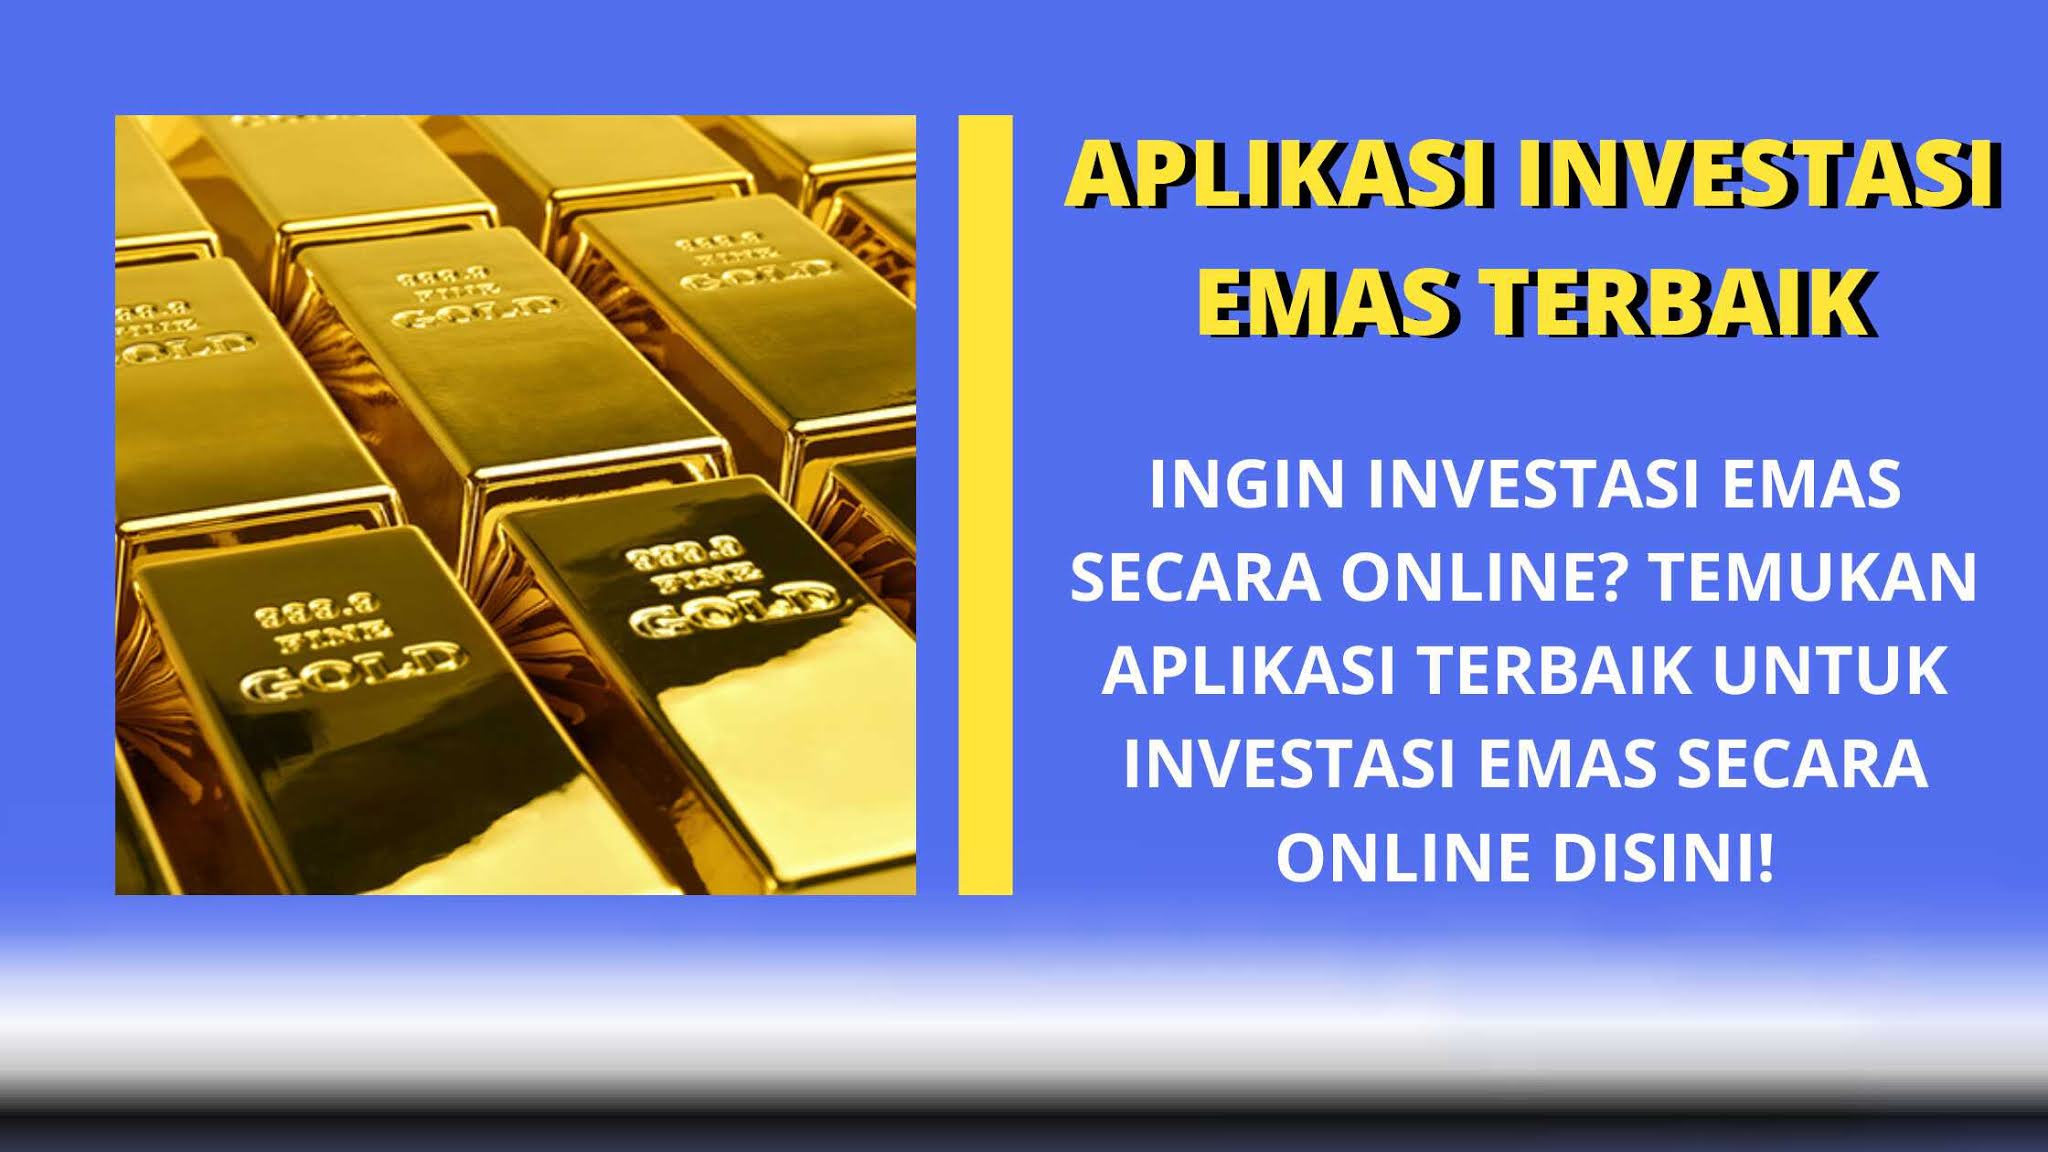 Aplikasi Investasi Emas Online Terbaik 2021